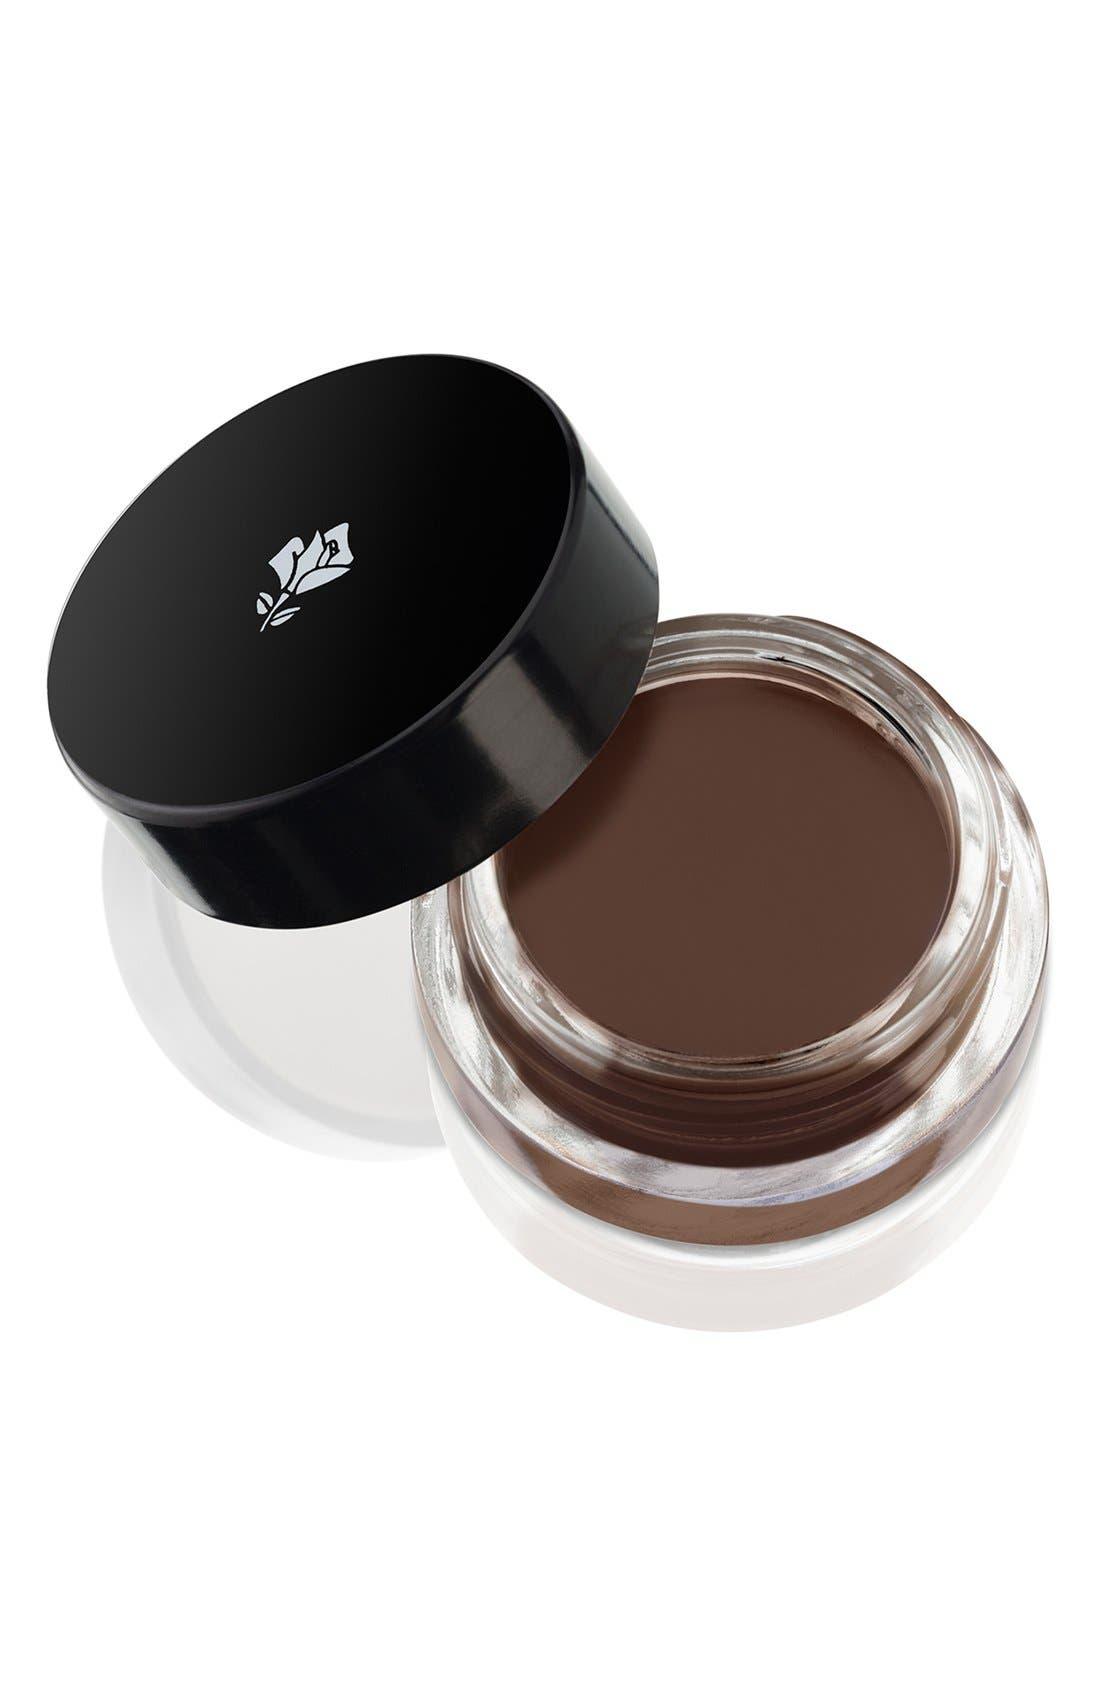 Sourcils Waterproof Eyebrow Gel-Cream,                             Main thumbnail 1, color,                             03 TAUPE